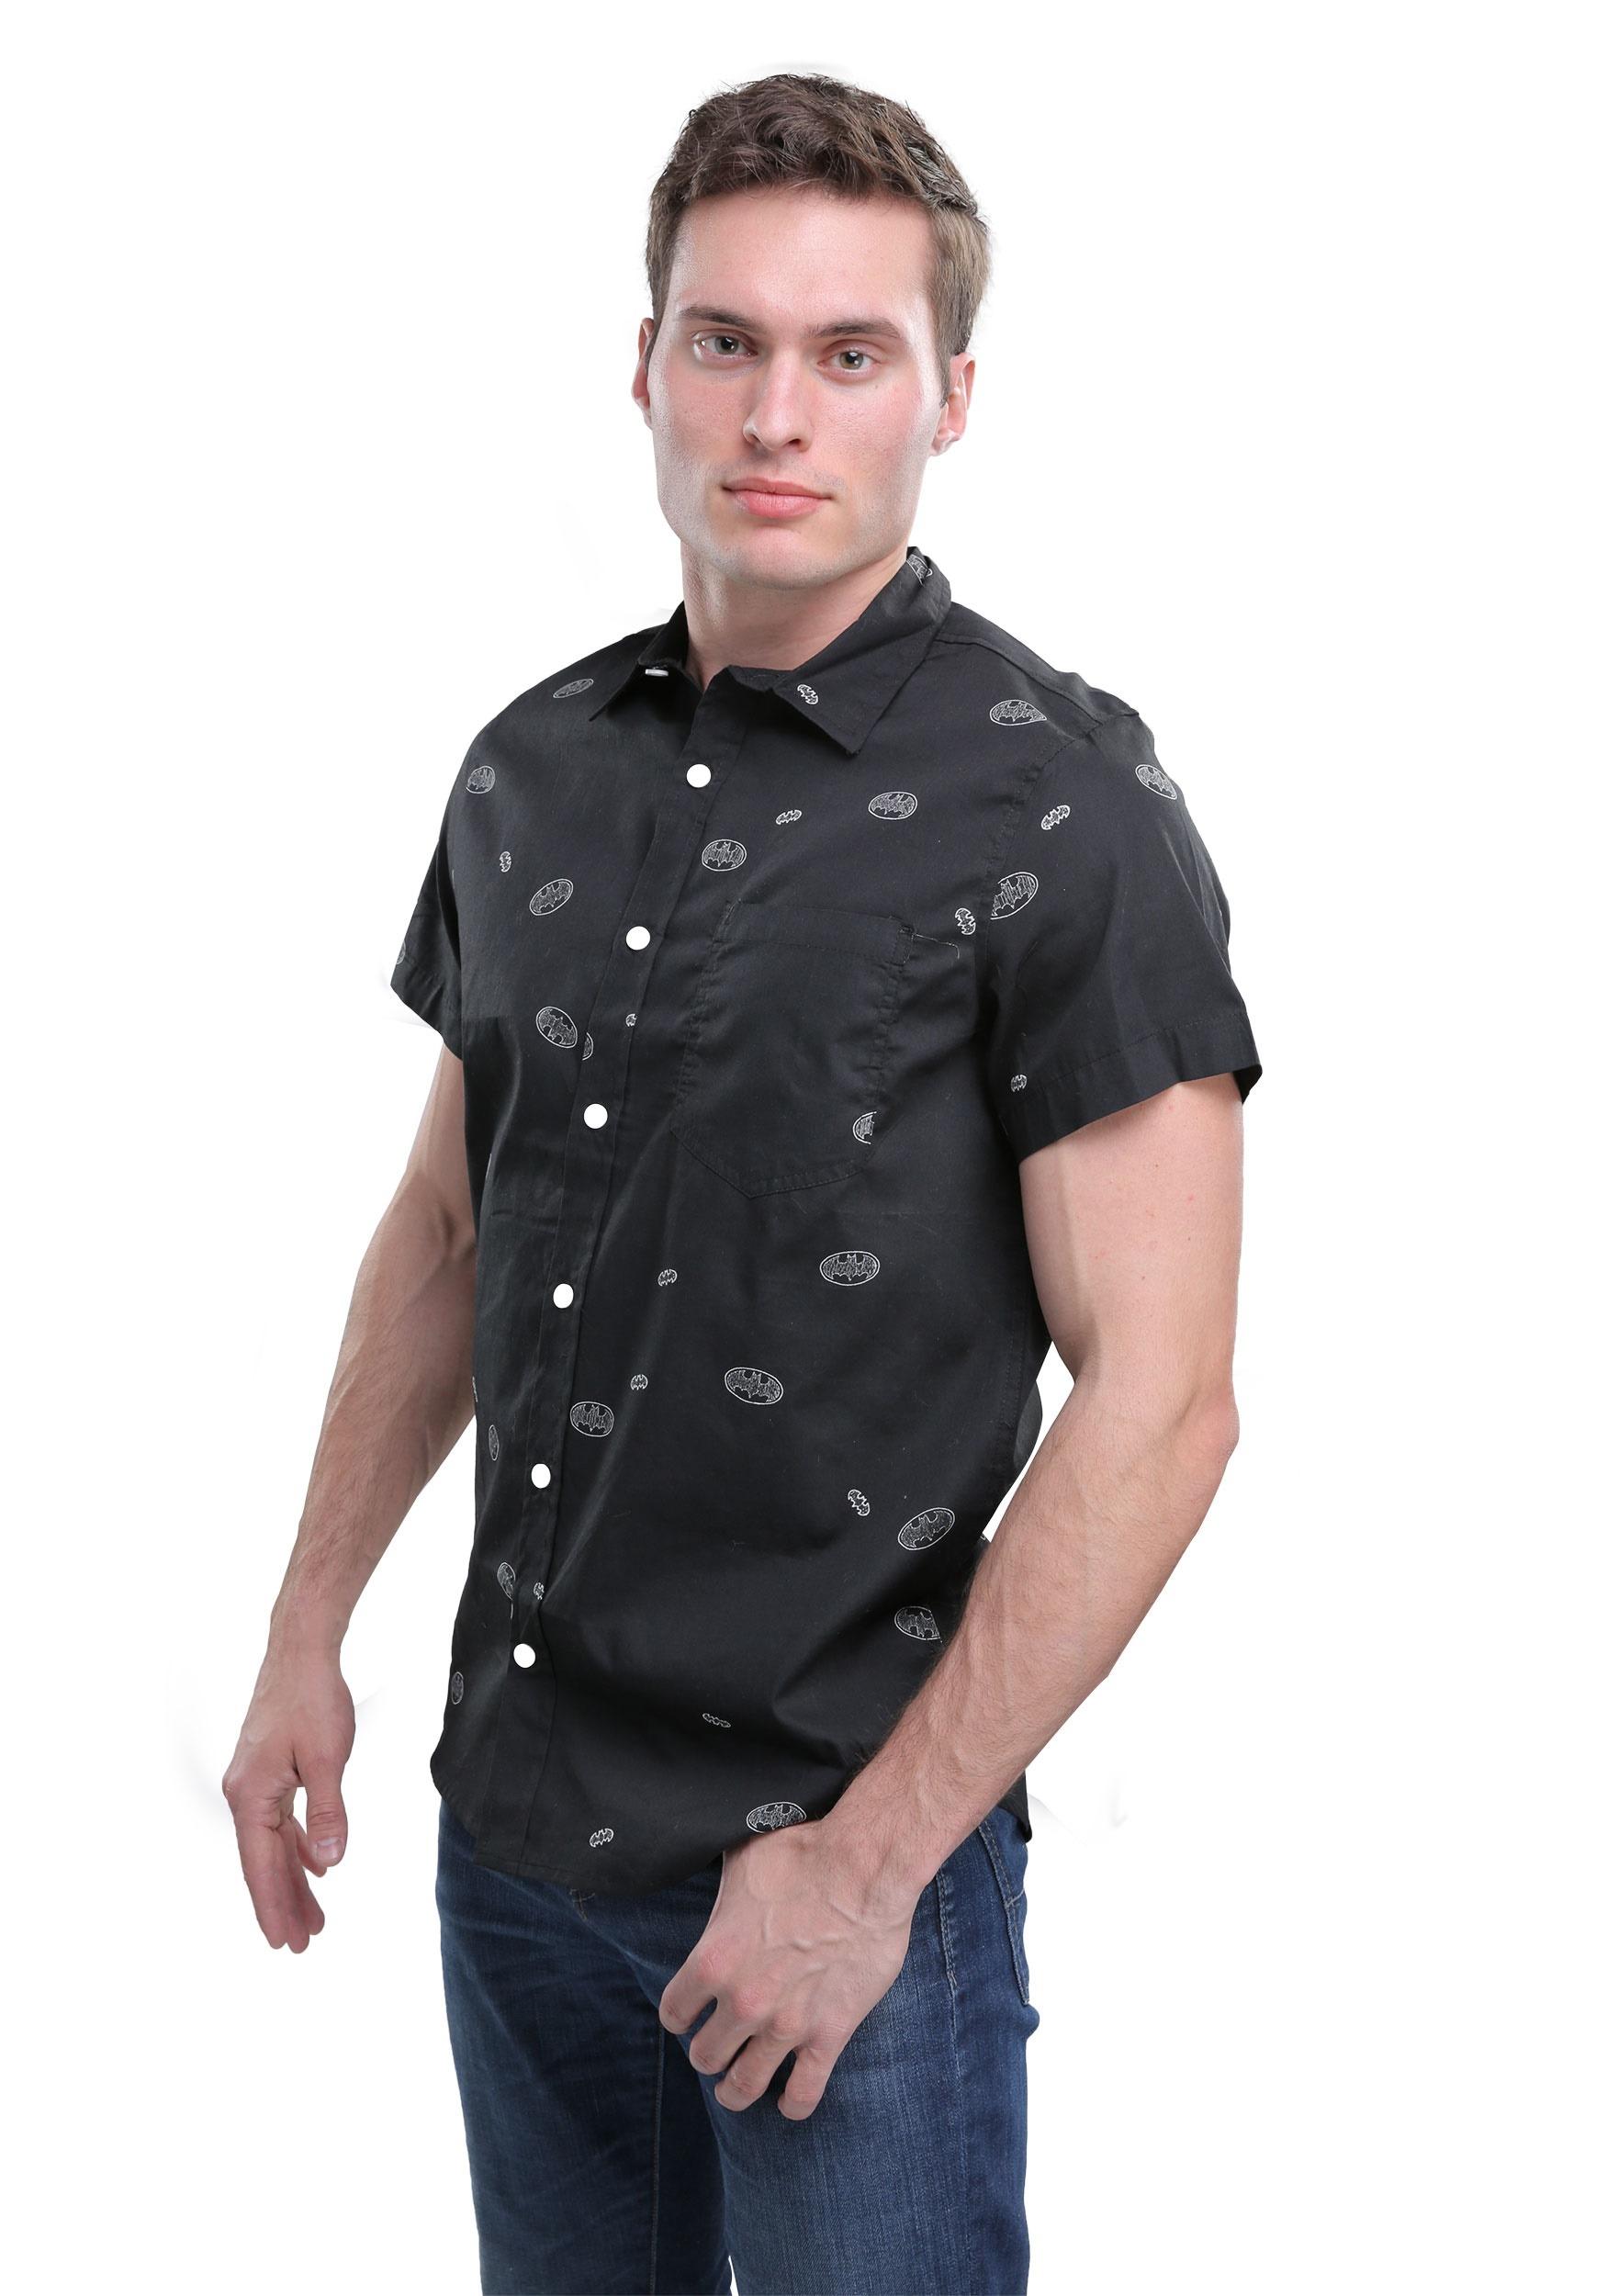 7696beb01 DC Comics Batman Woven Button Down Shirt for Men